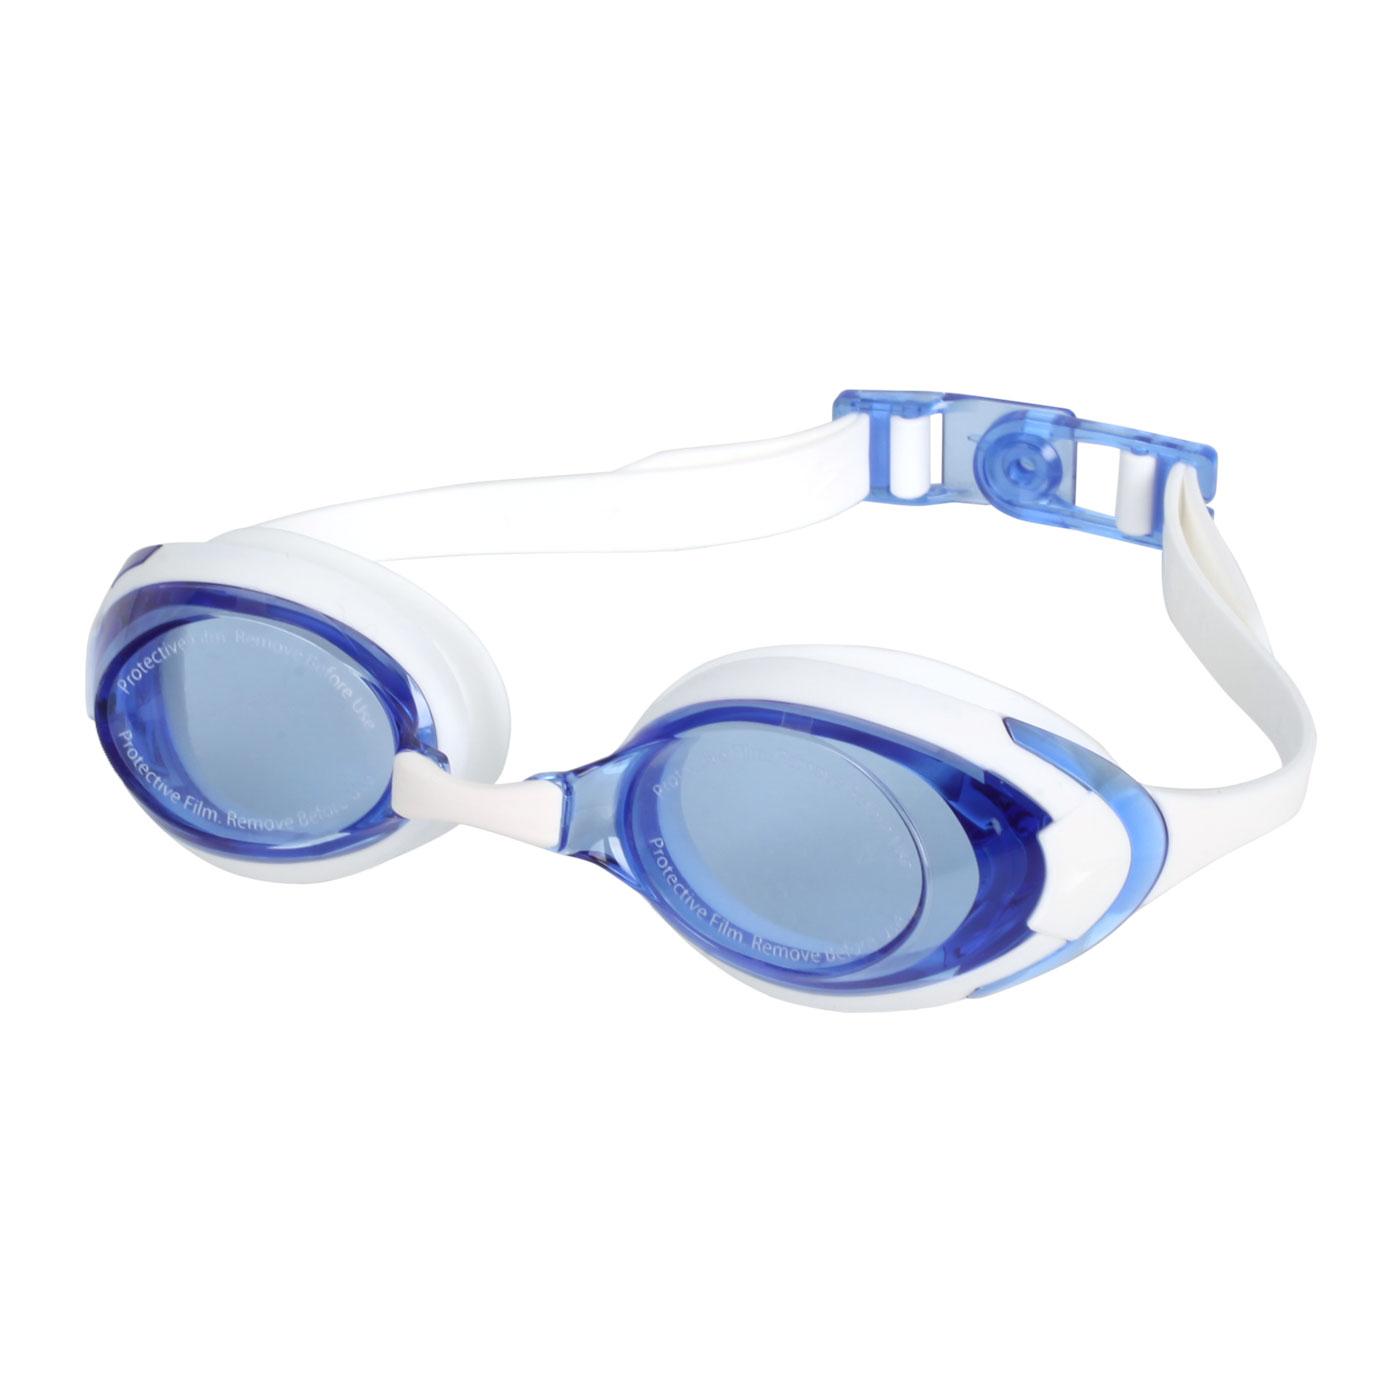 SPEEDO 成人運動泳鏡 SD812272D665